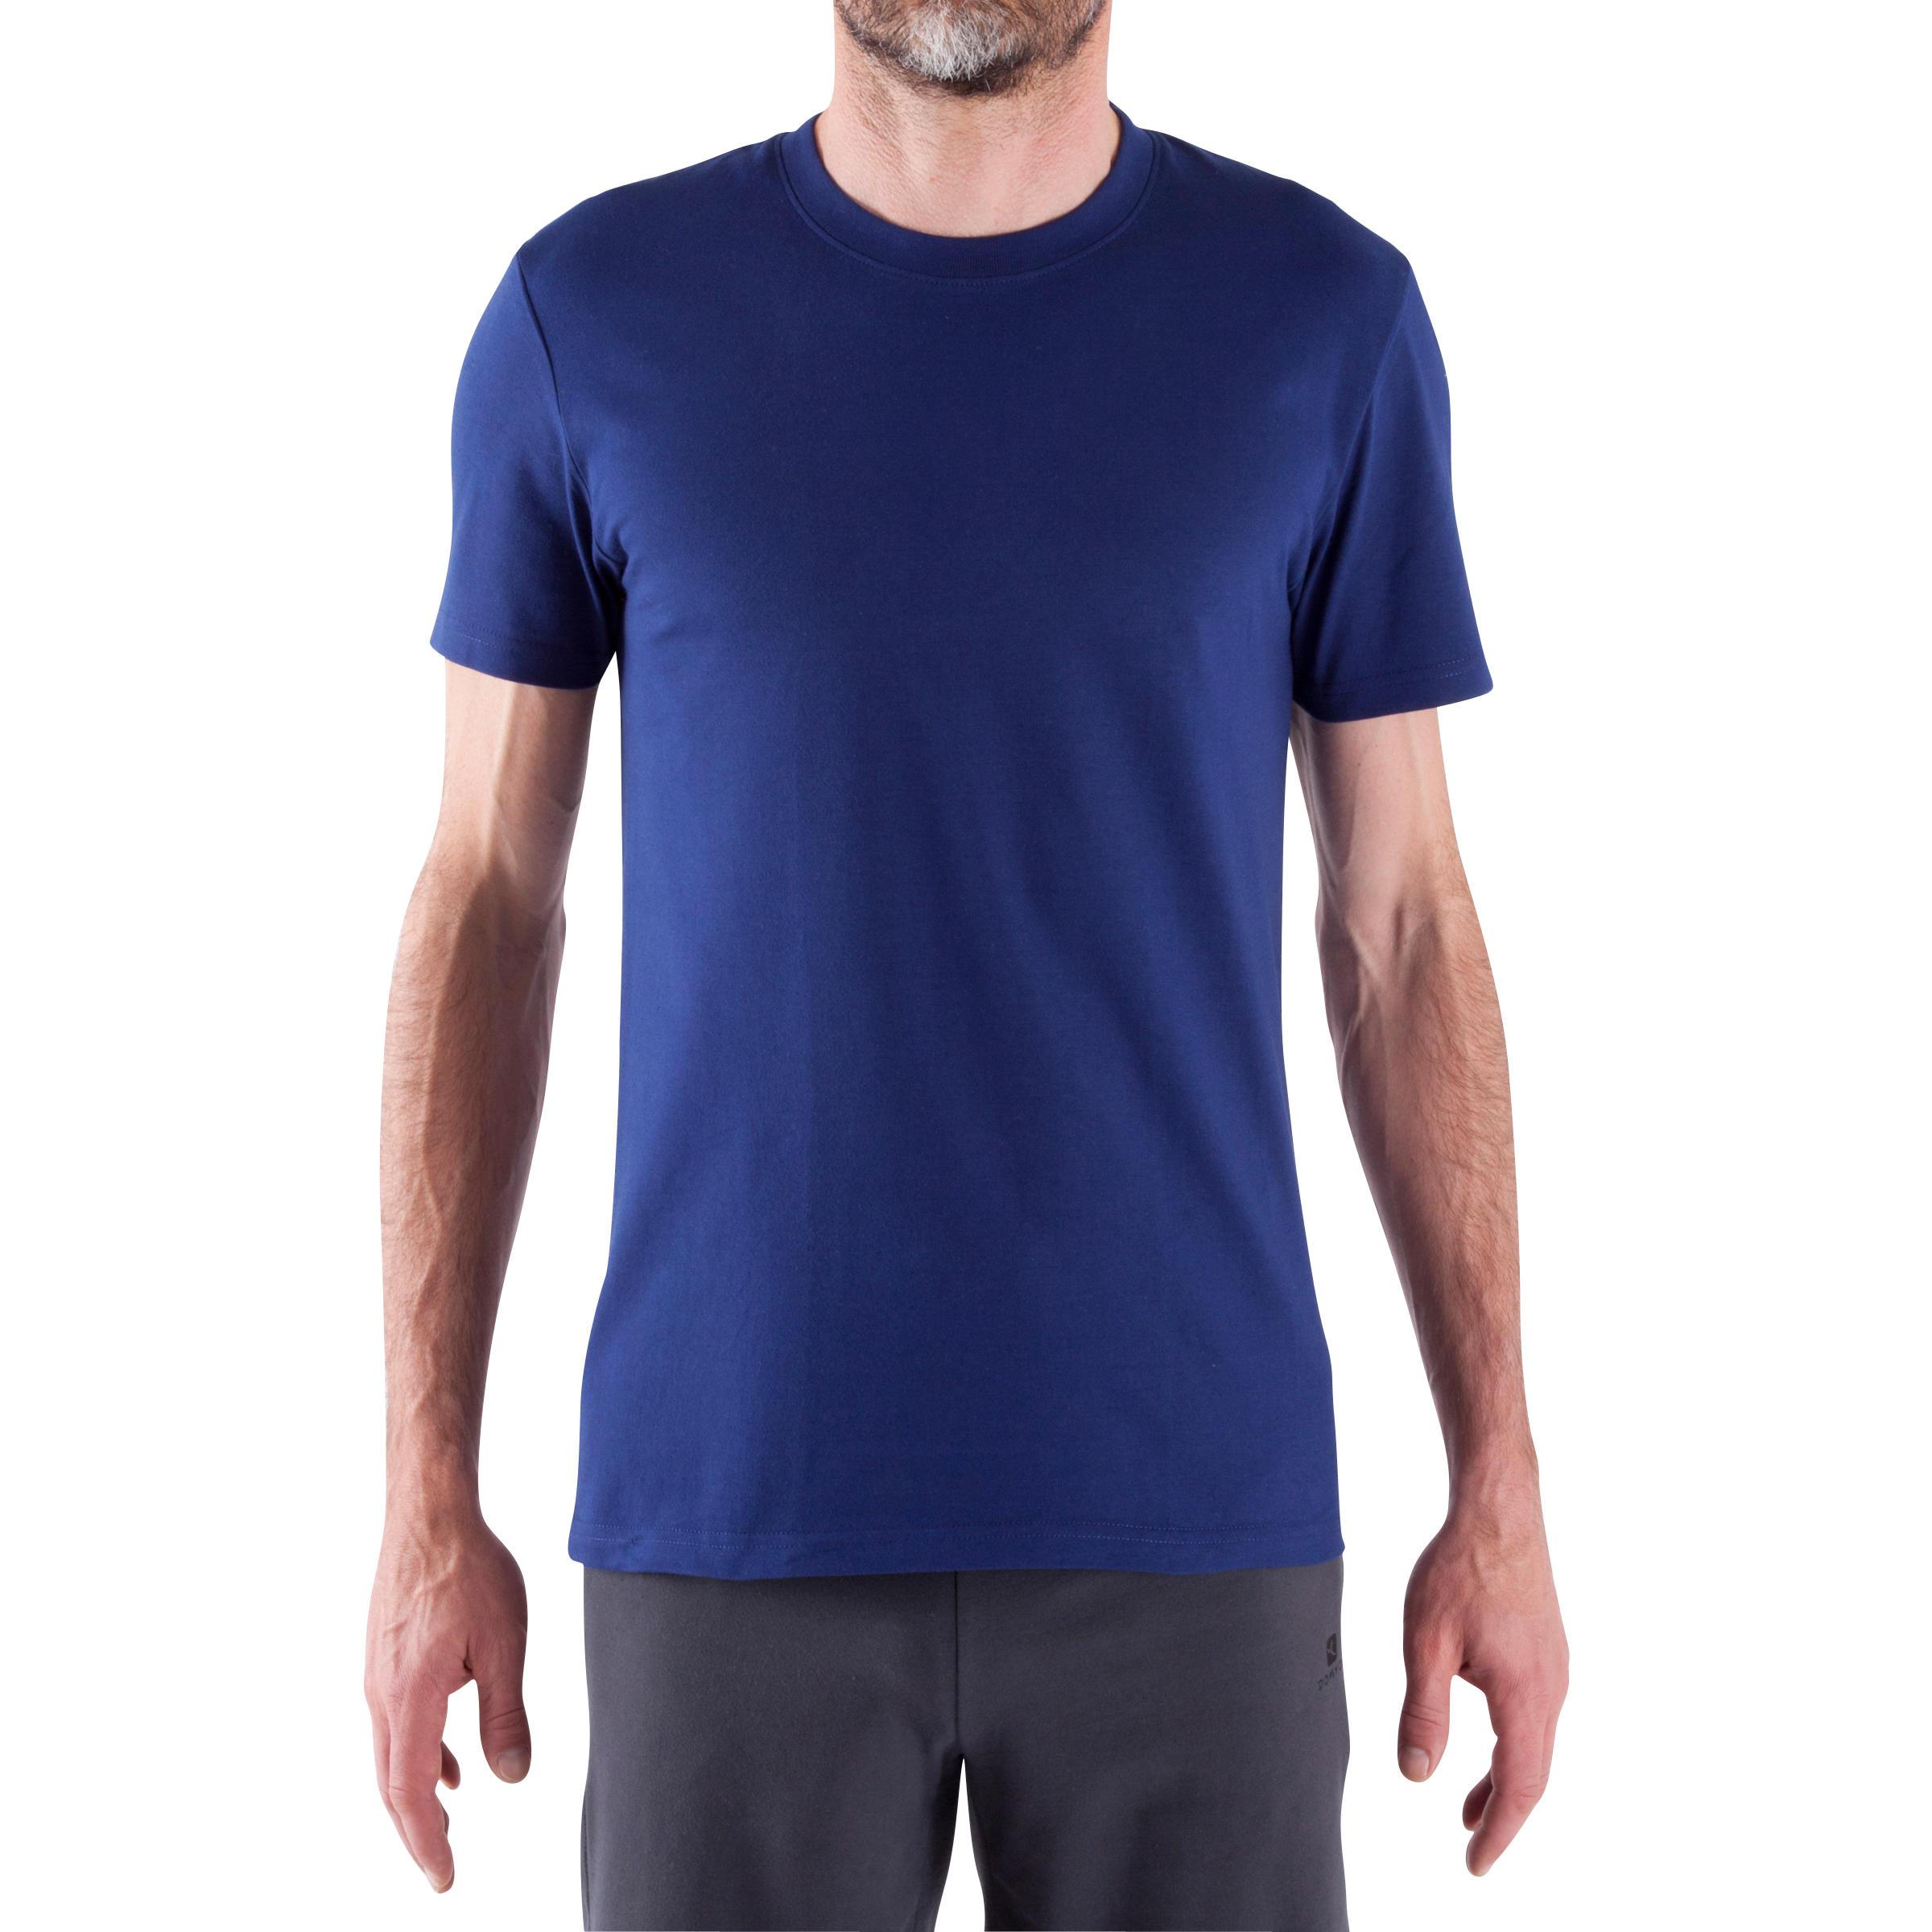 Essential Athletee Cotton Fitness T-Shirt - Dark Blue